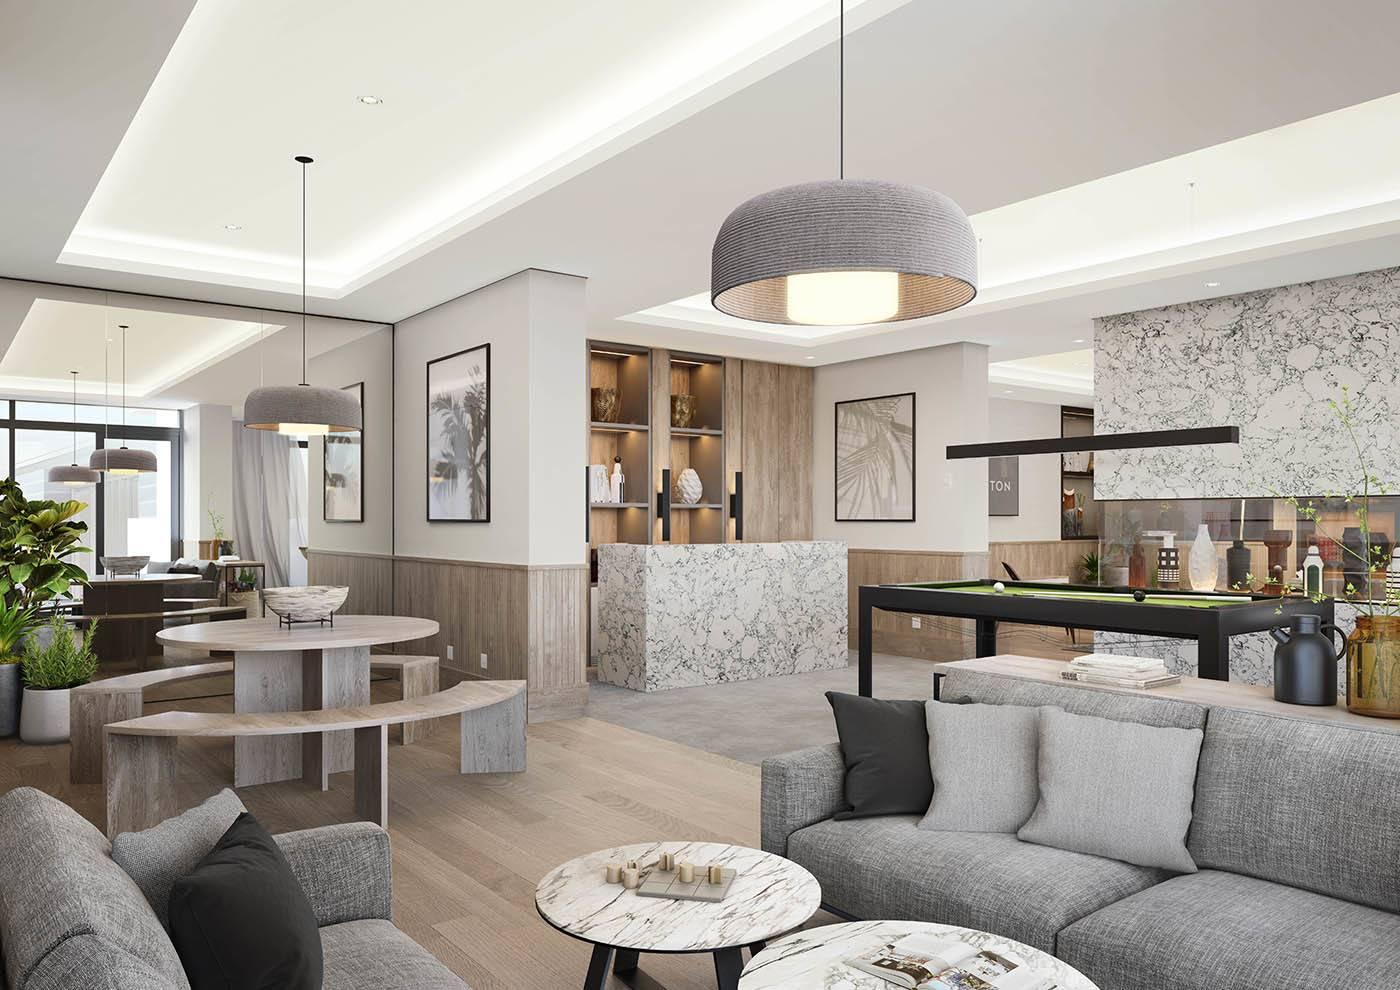 Striking Interiors | Chic Resident's Lounge